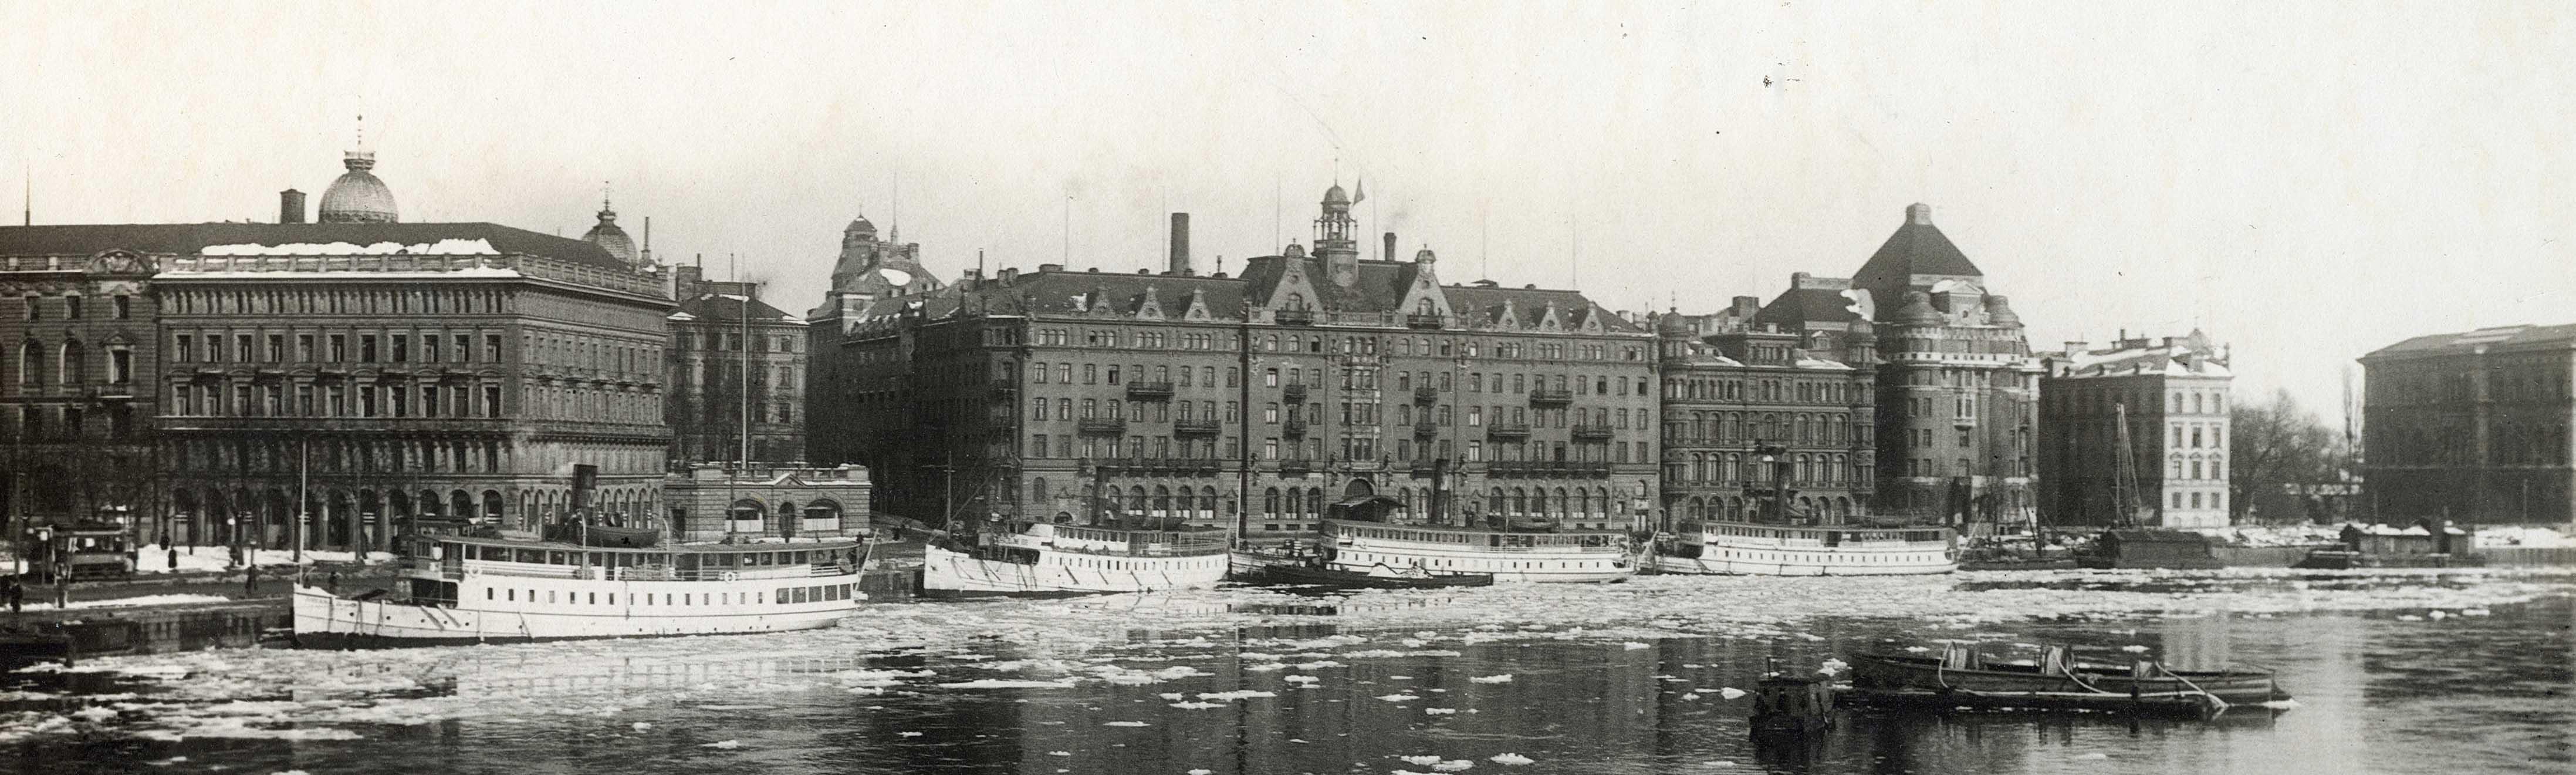 Rumslig arkitektur Stockholm